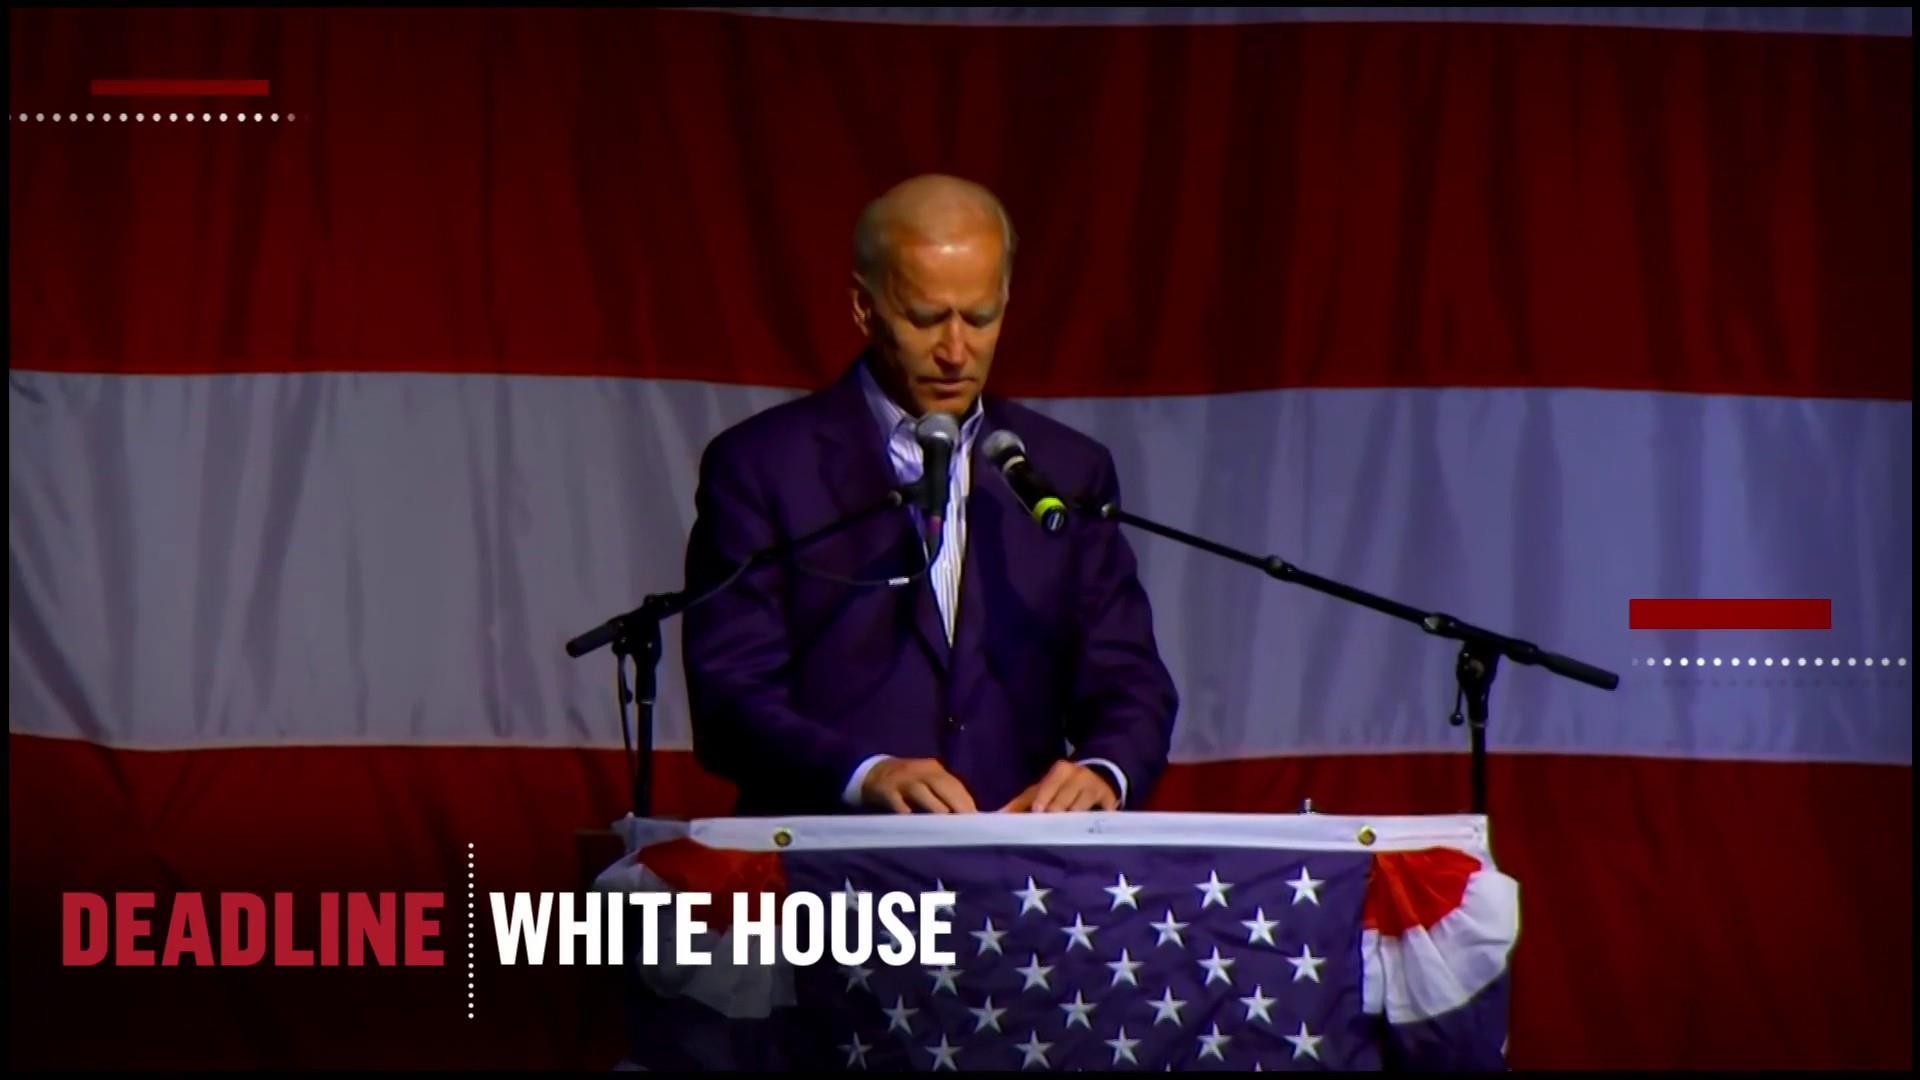 Biden advisors say the former Vice President faces an 'unfair double standard'